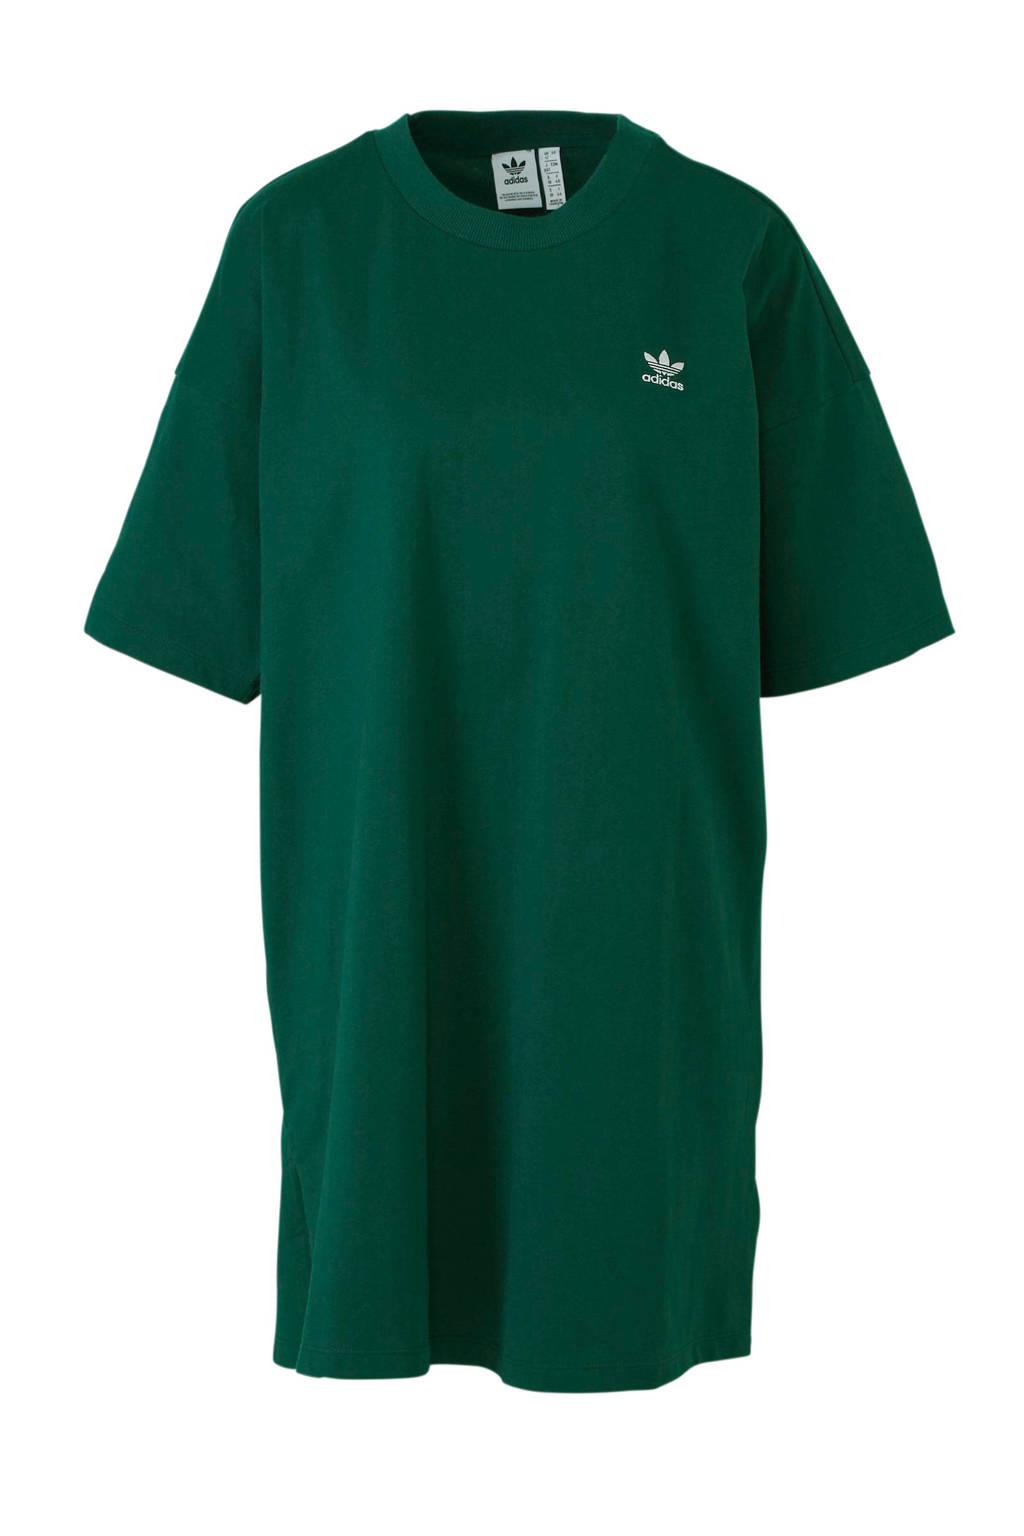 adidas originals jurk, Groen/wit